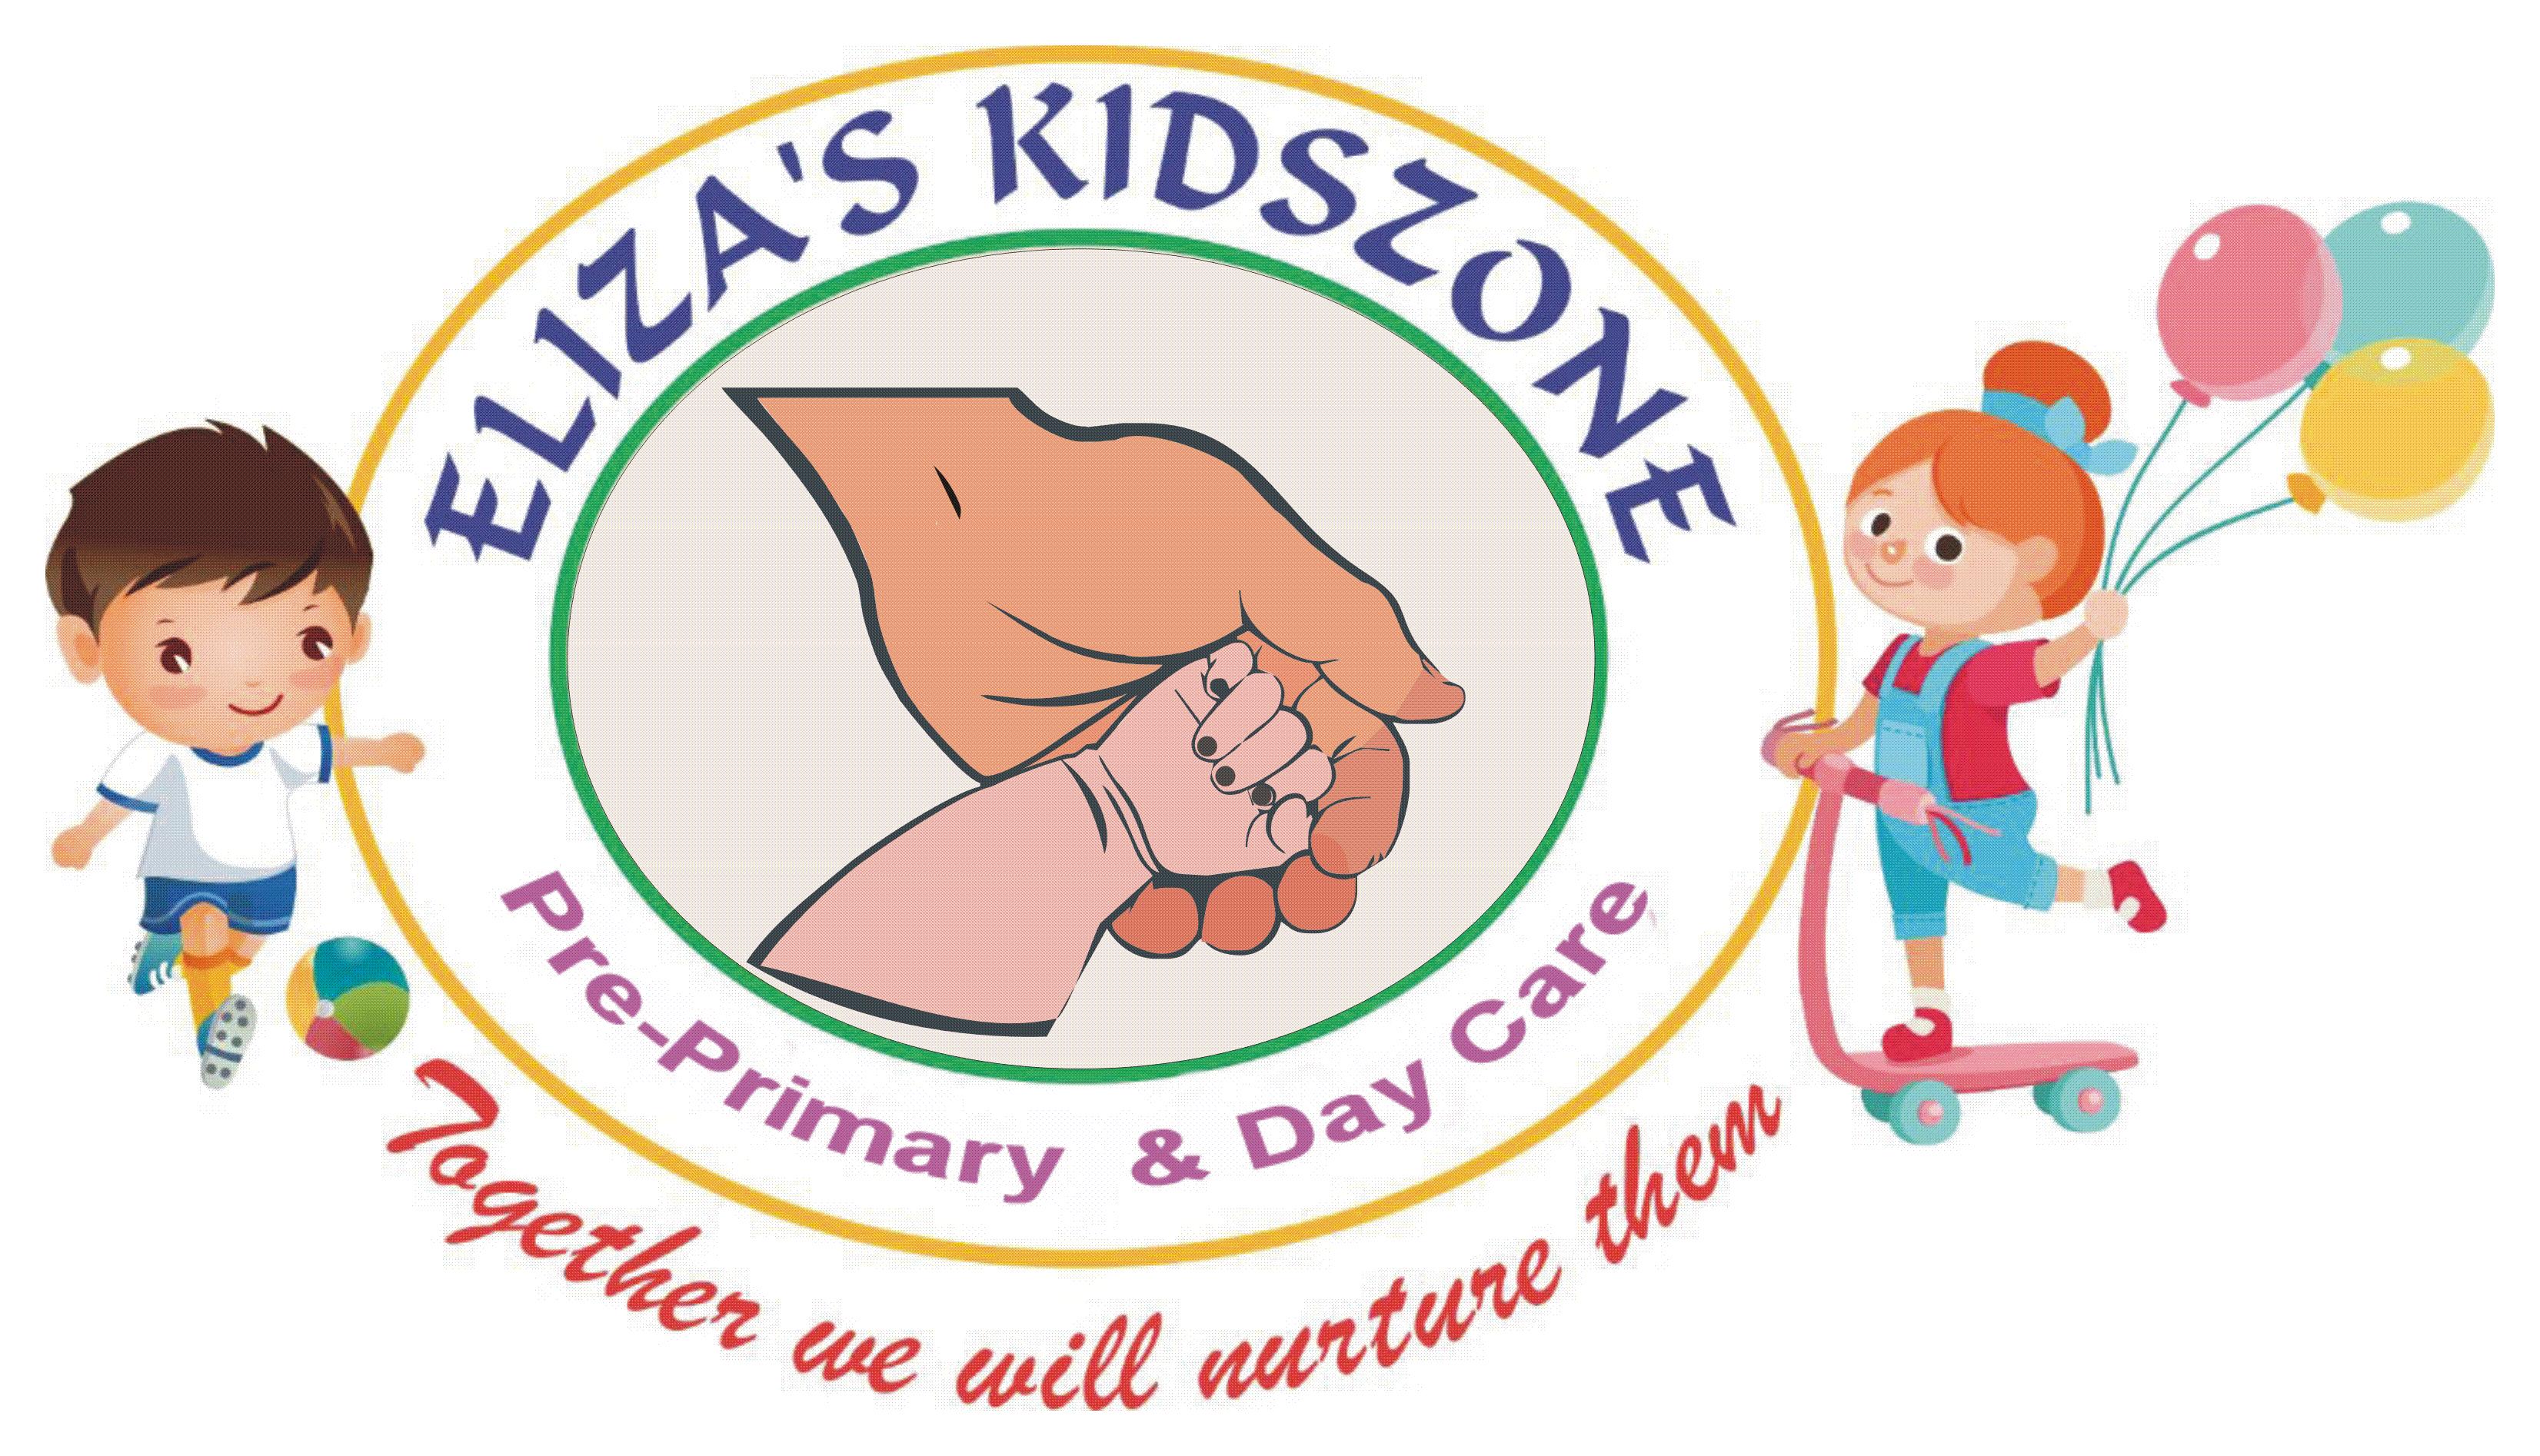 Eliza Kidszone - logo